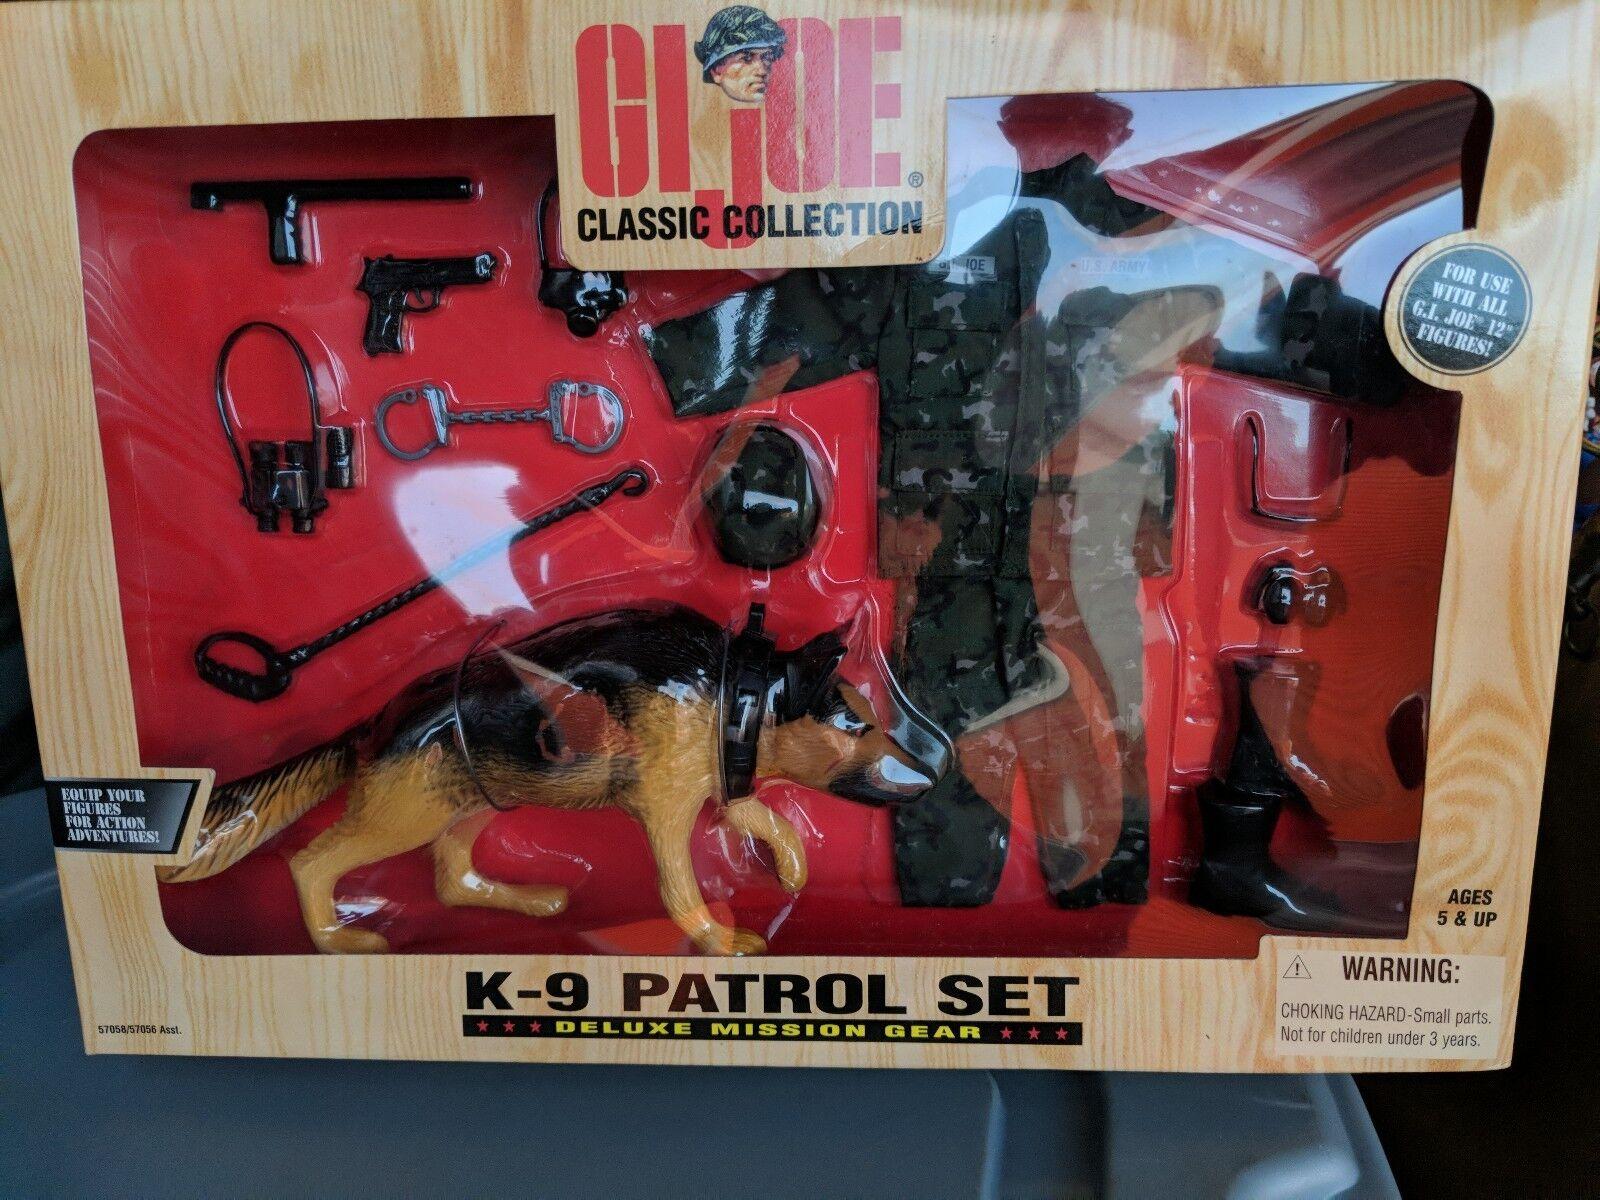 Hasbro spielzeug 12 zoll gi joe k - 9 - patrouille mission ausrüstung neue 1998